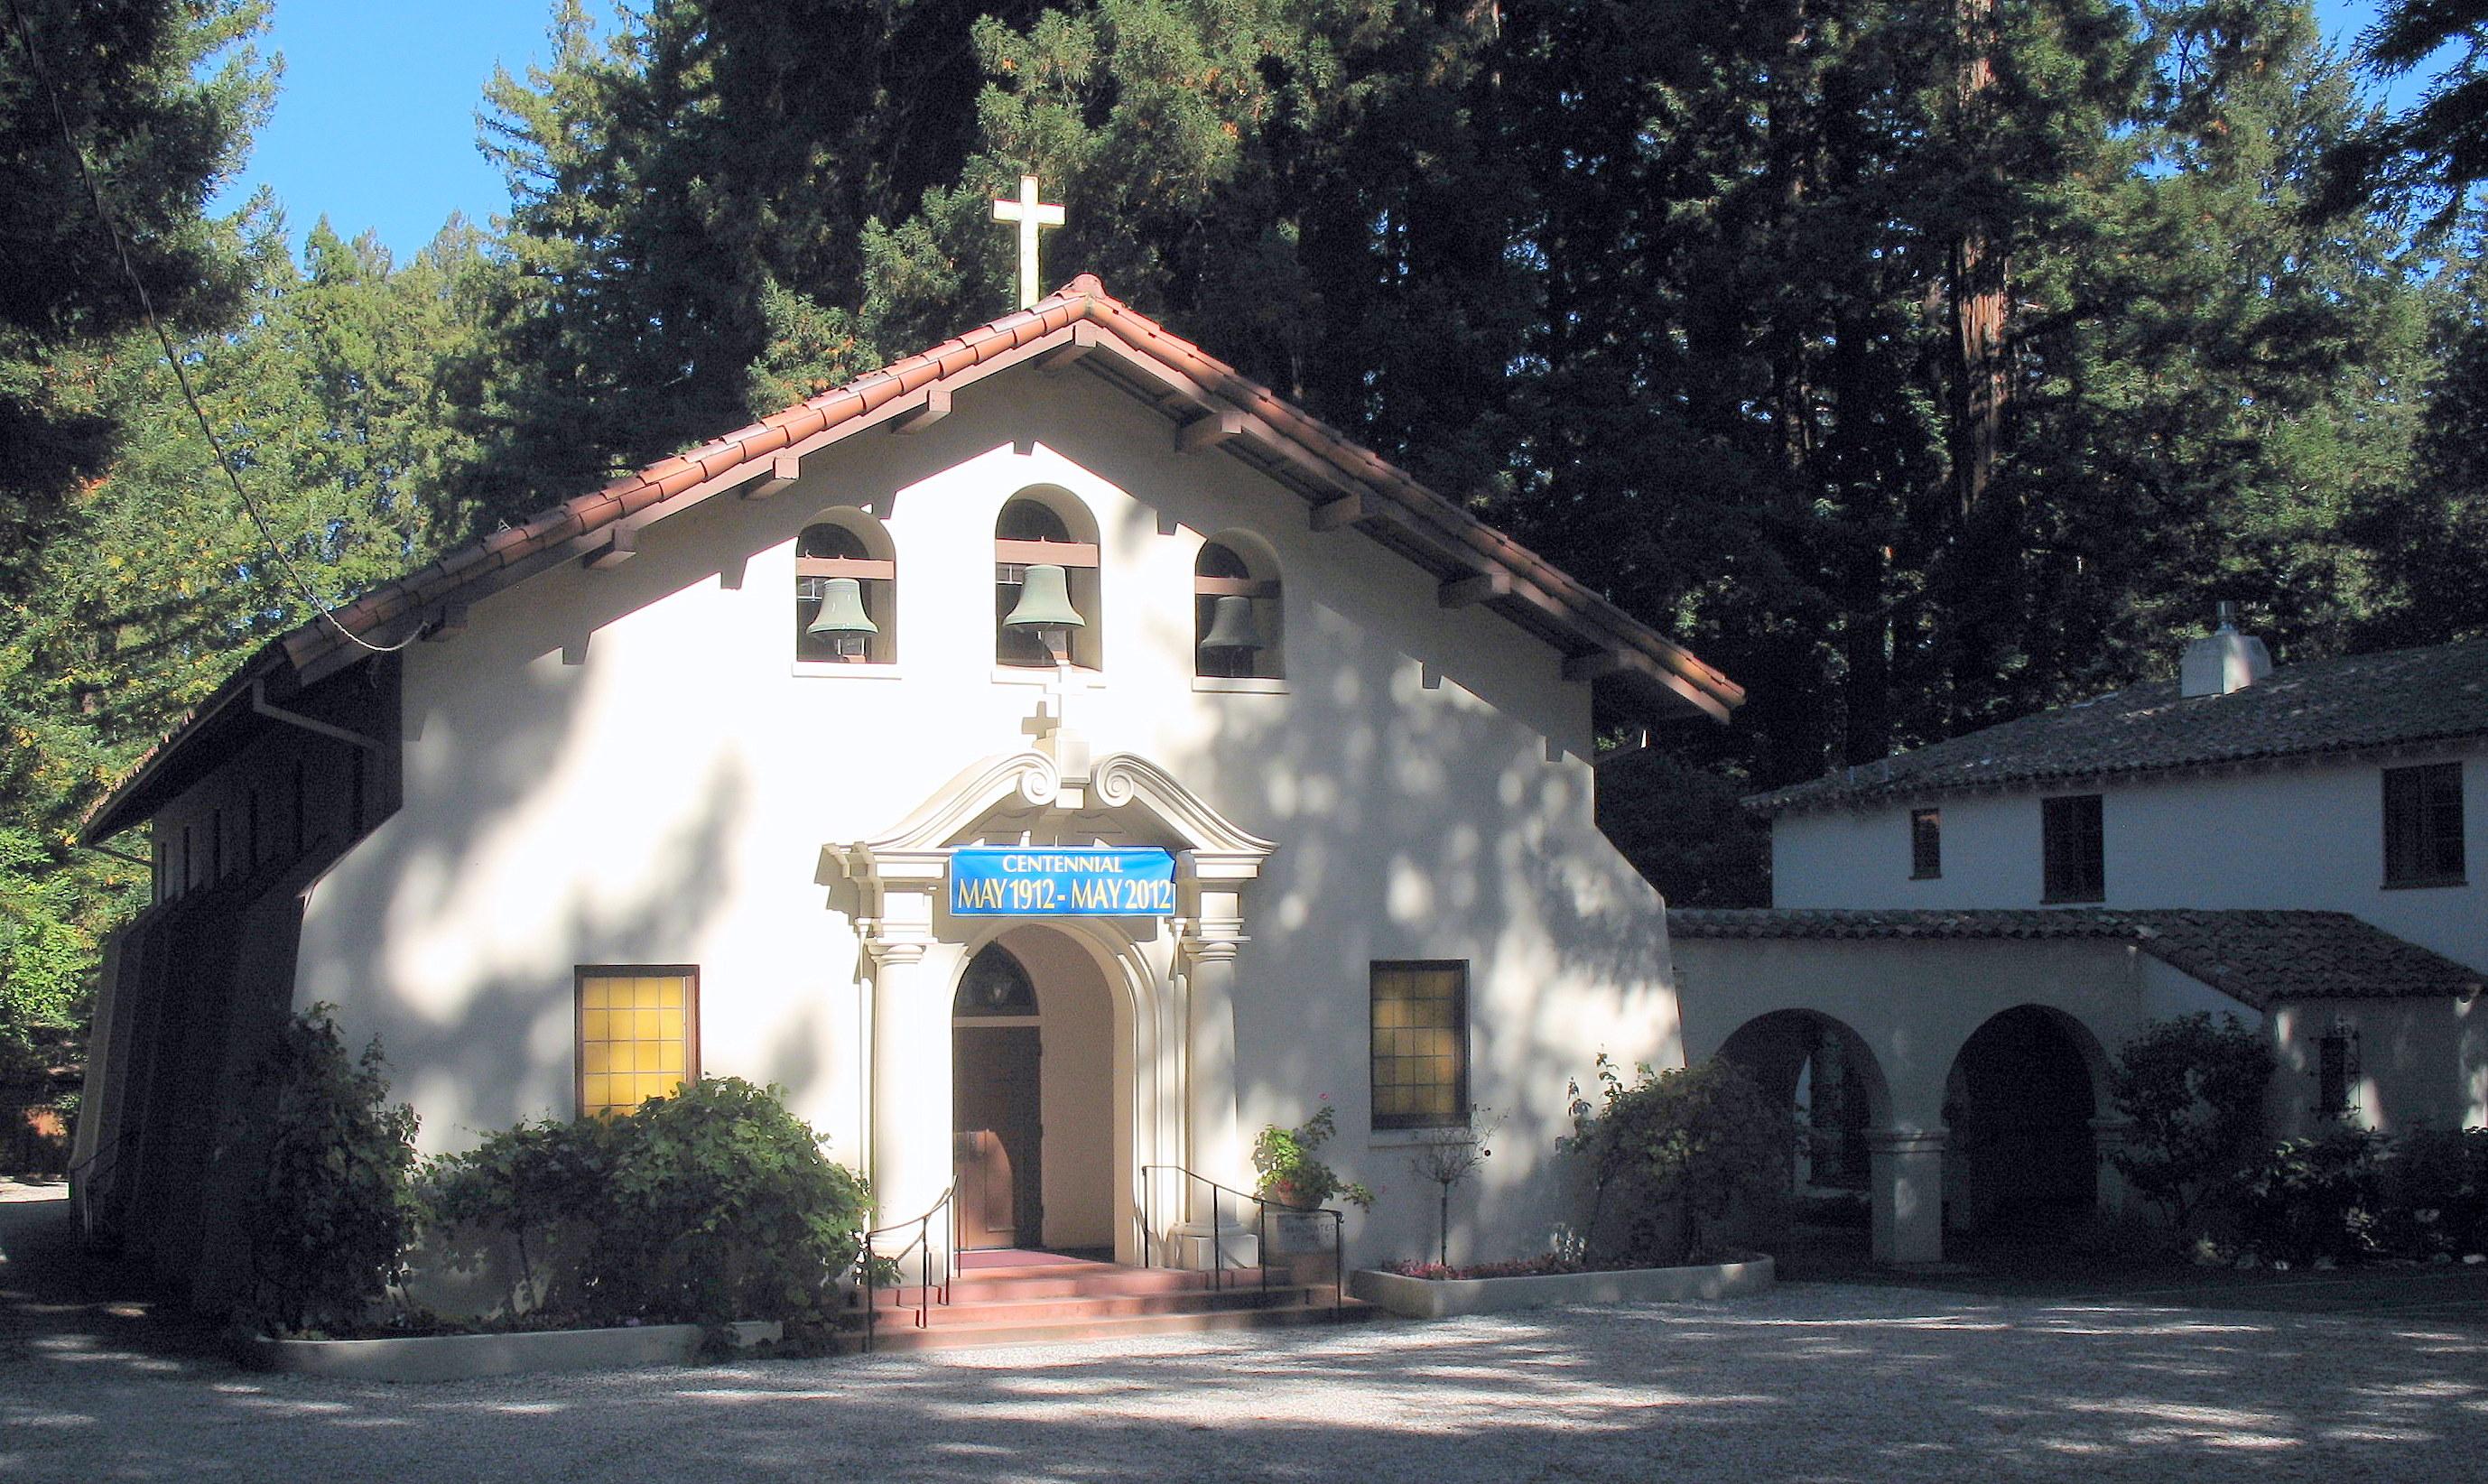 sex dating in portola valley california